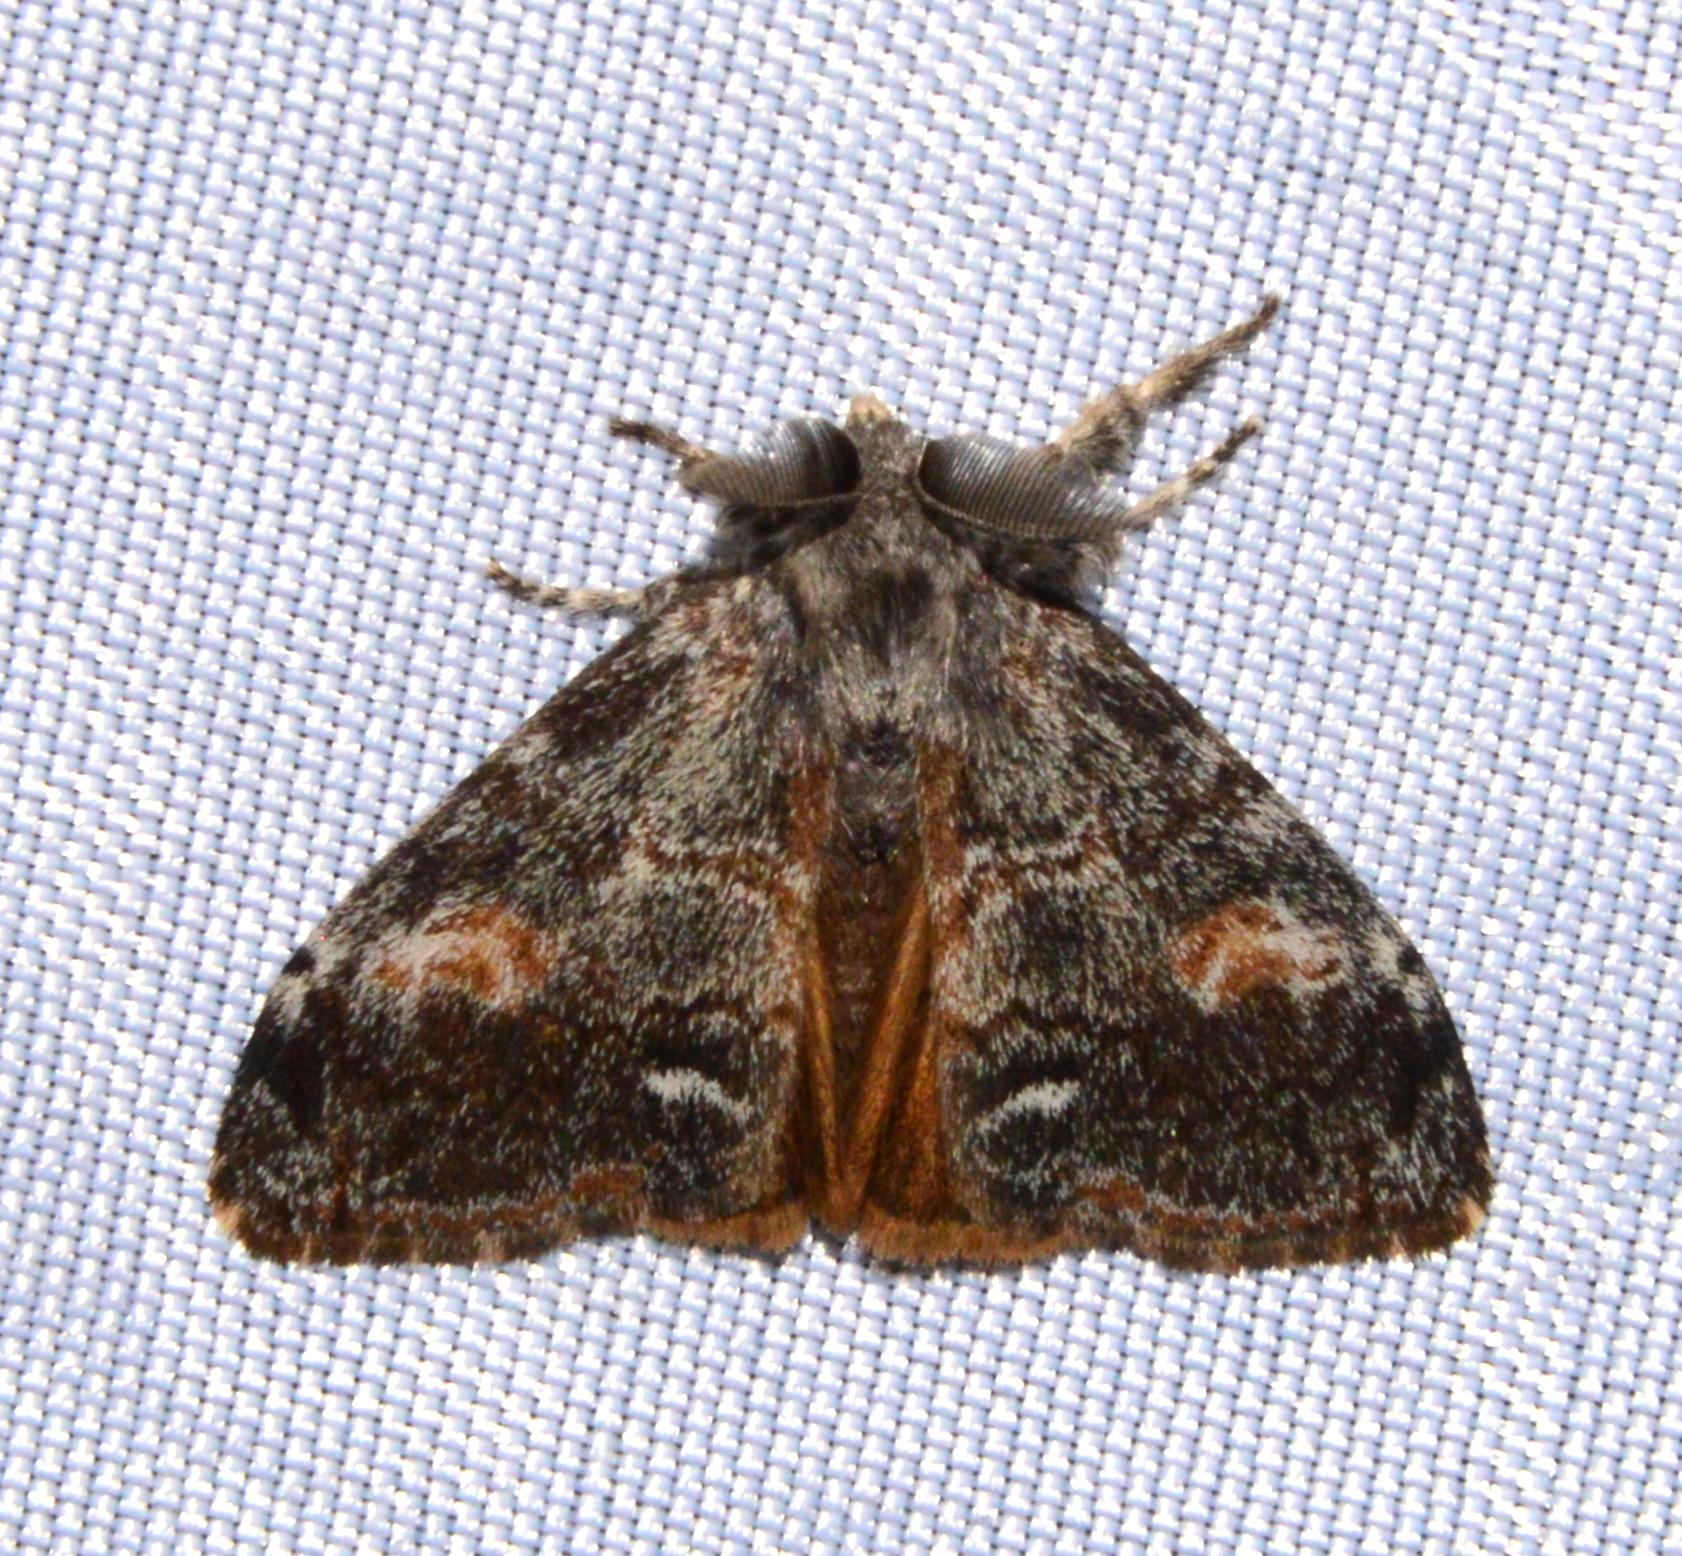 Orgyia pseudotsugata - The Douglas-fir tussock moth